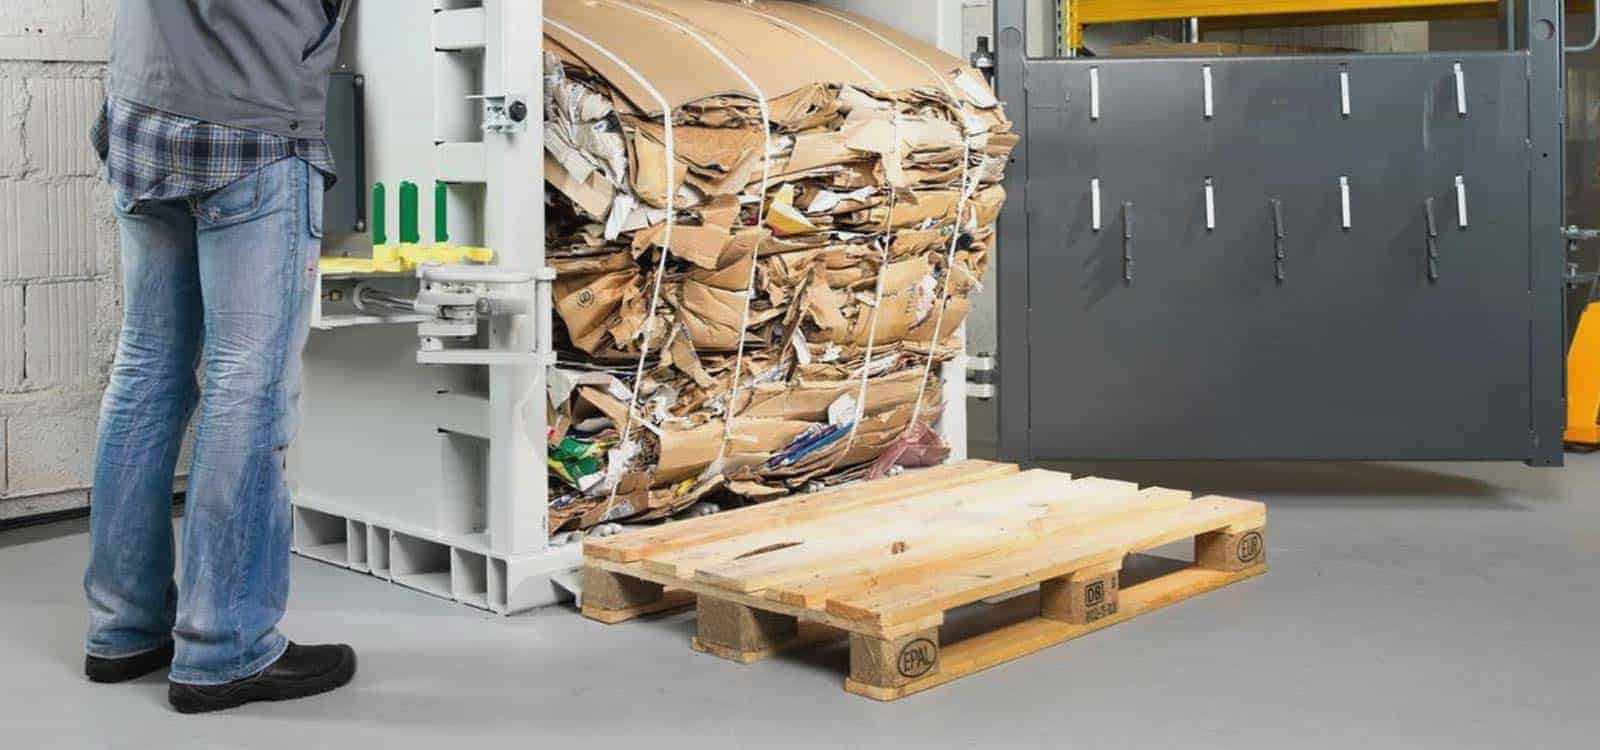 Cardboard Balers And Compactors Vertical Cardboard